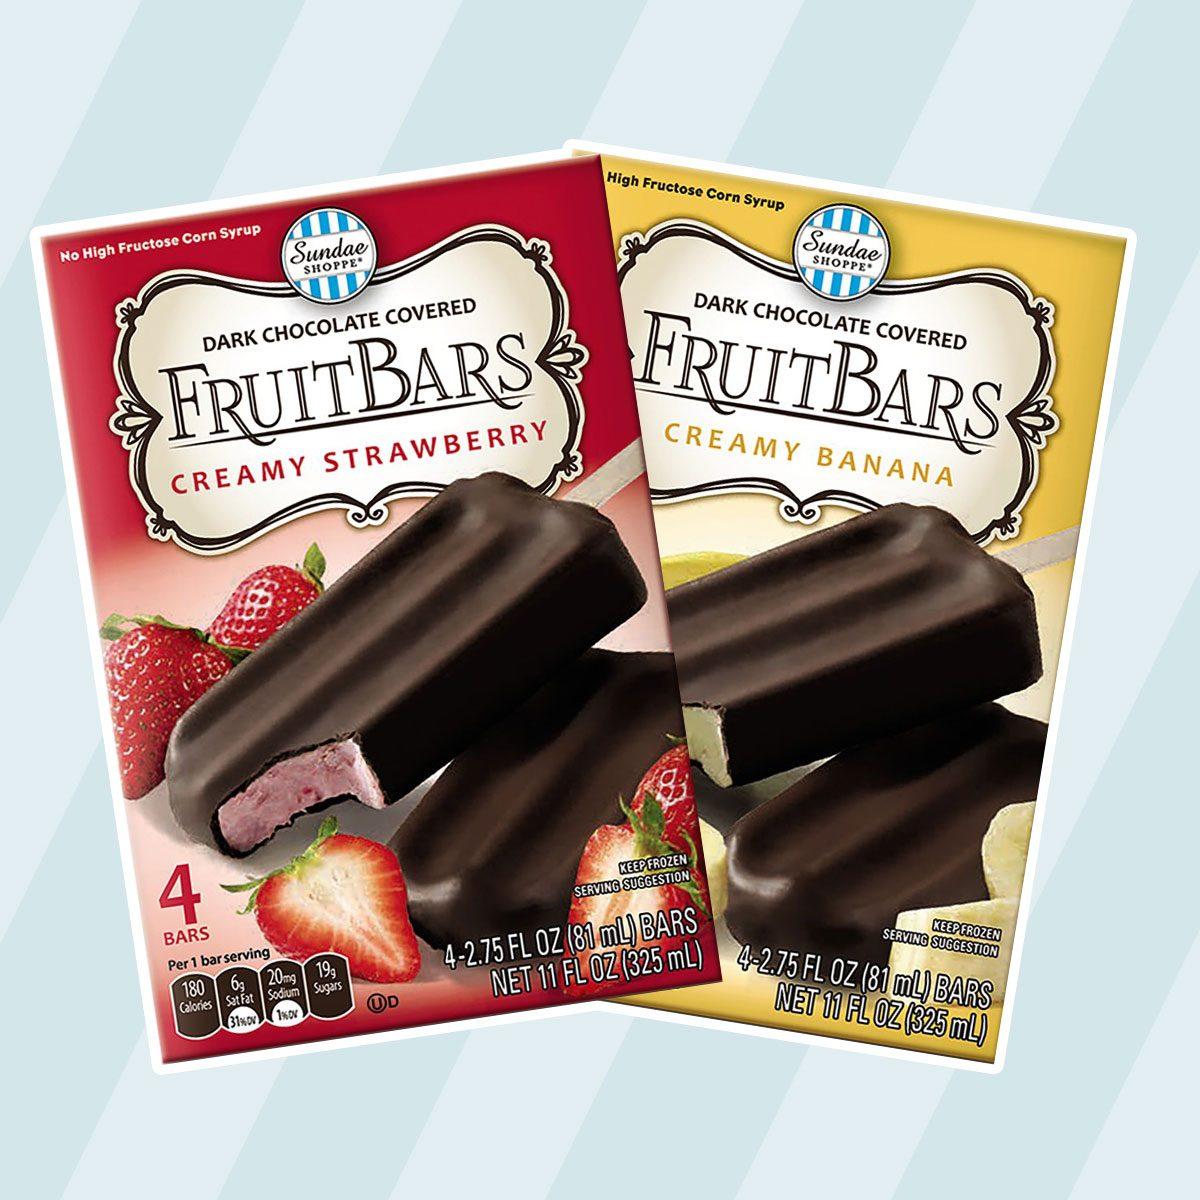 Chocolate Enrobed Assorted Fruit Bars